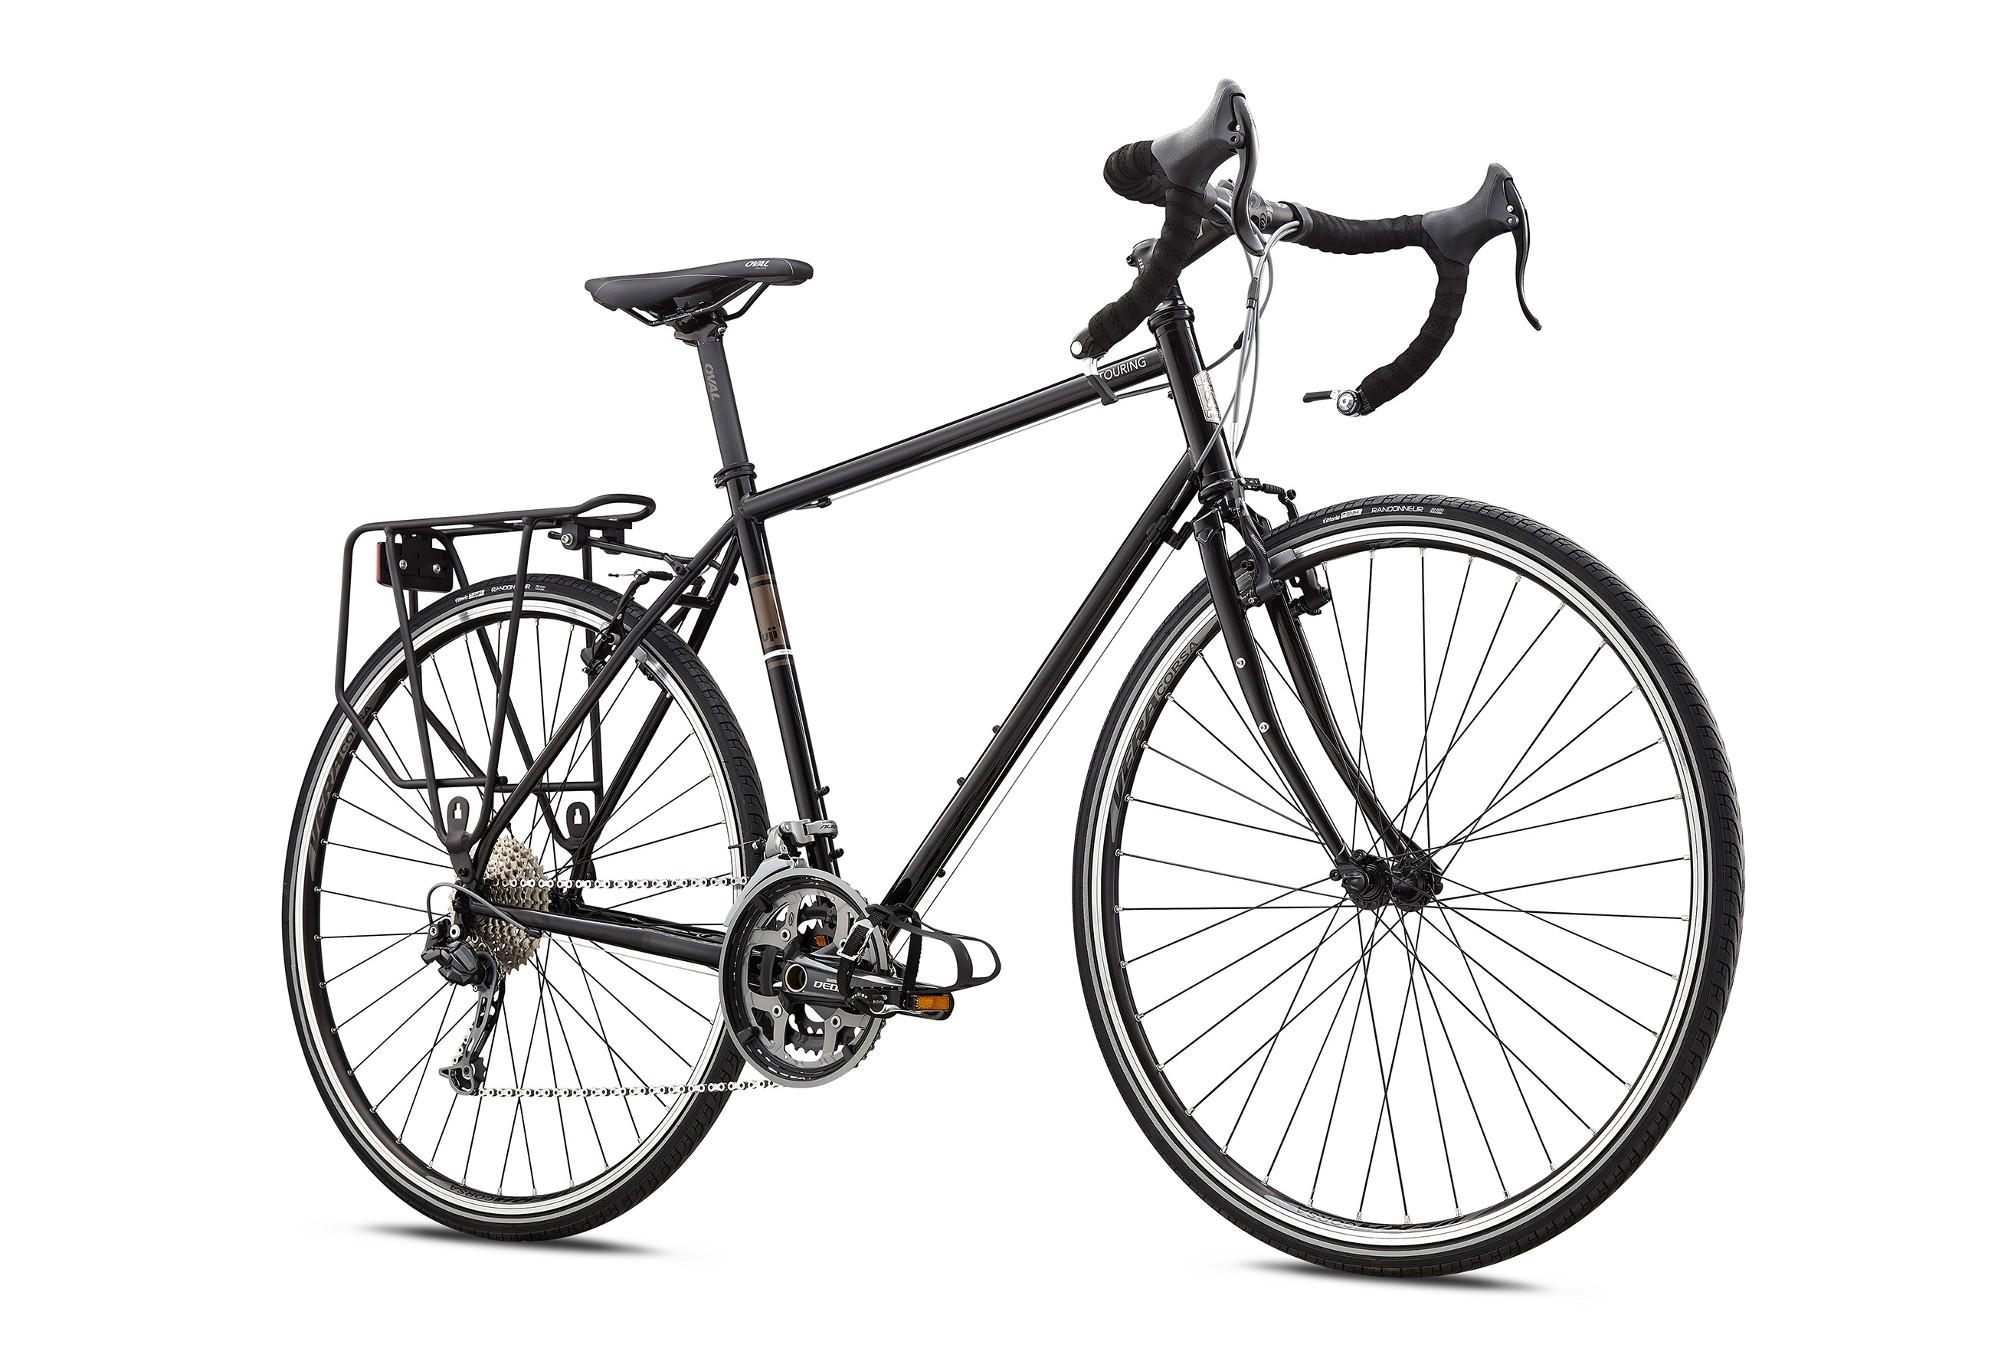 Travel Bike FUJI 2018 TOURING Shimano Alivio 9s Black | Alltricks.com